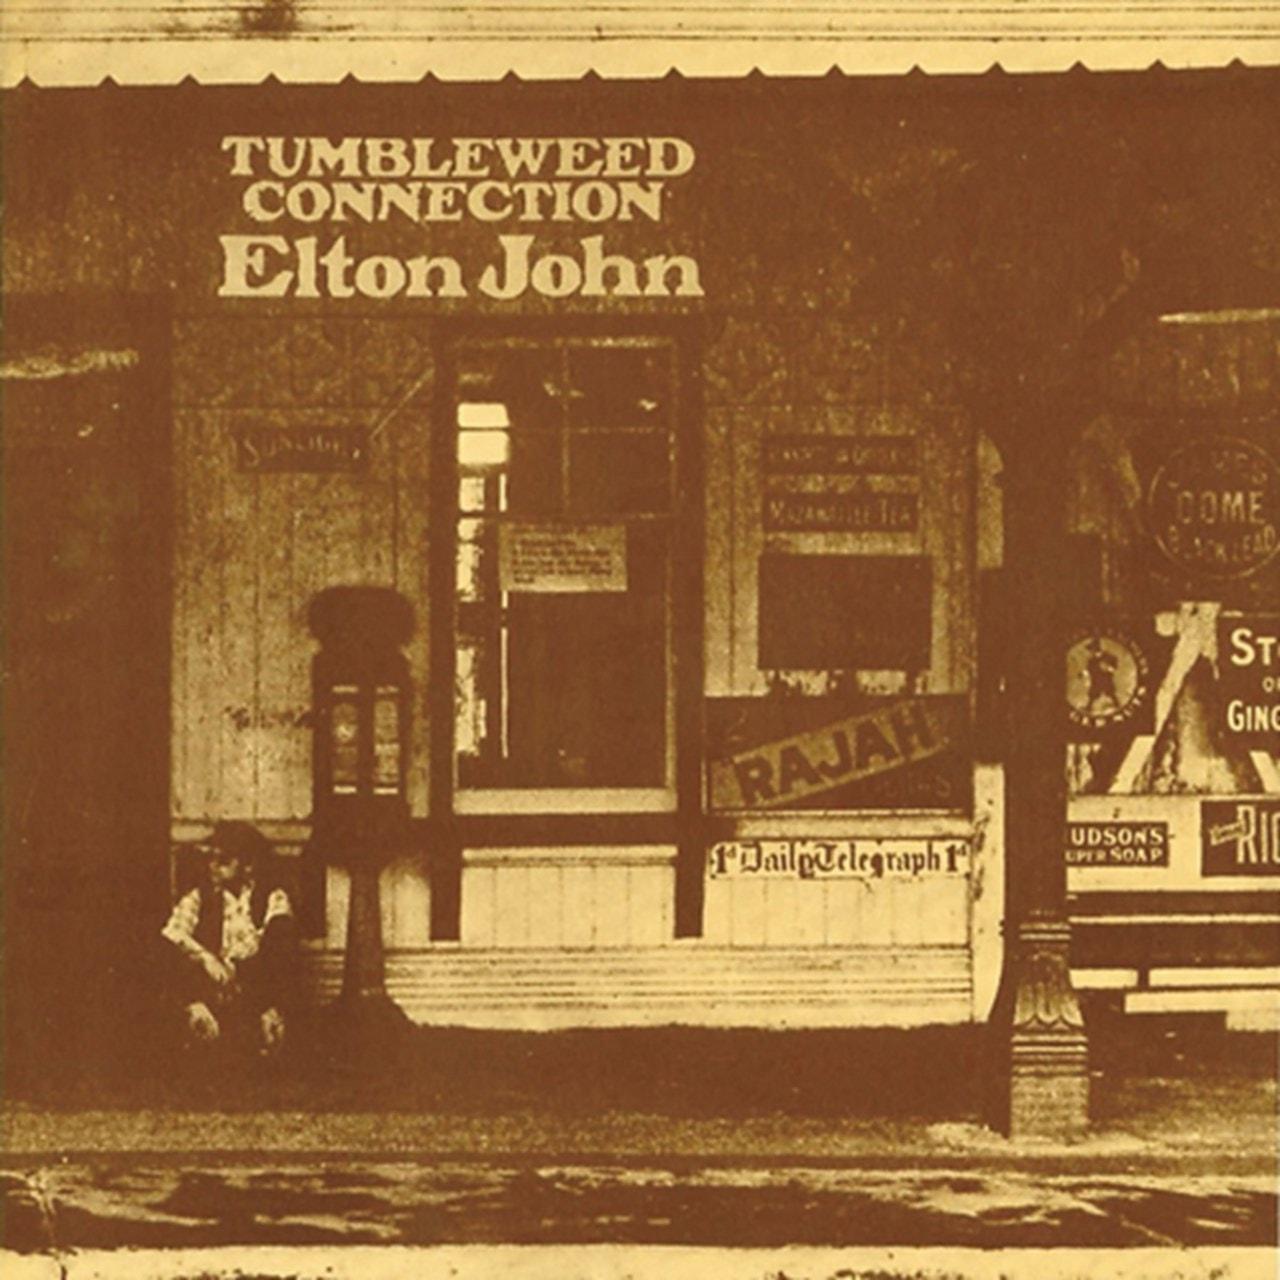 Tumbleweed Connection - 1